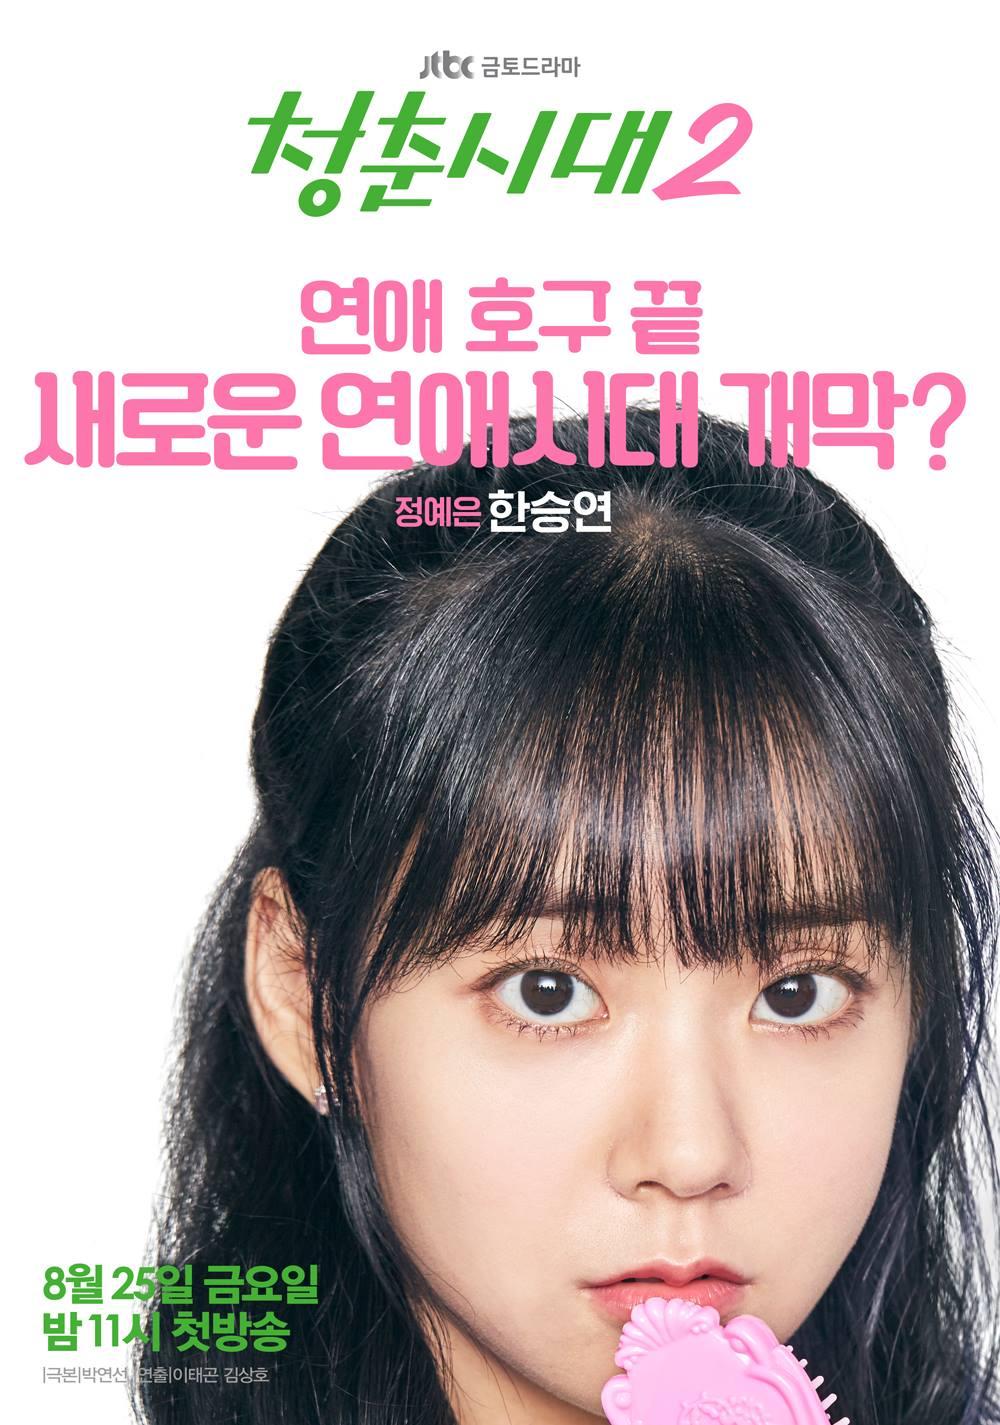 Han-Seung-Yeon.jpg